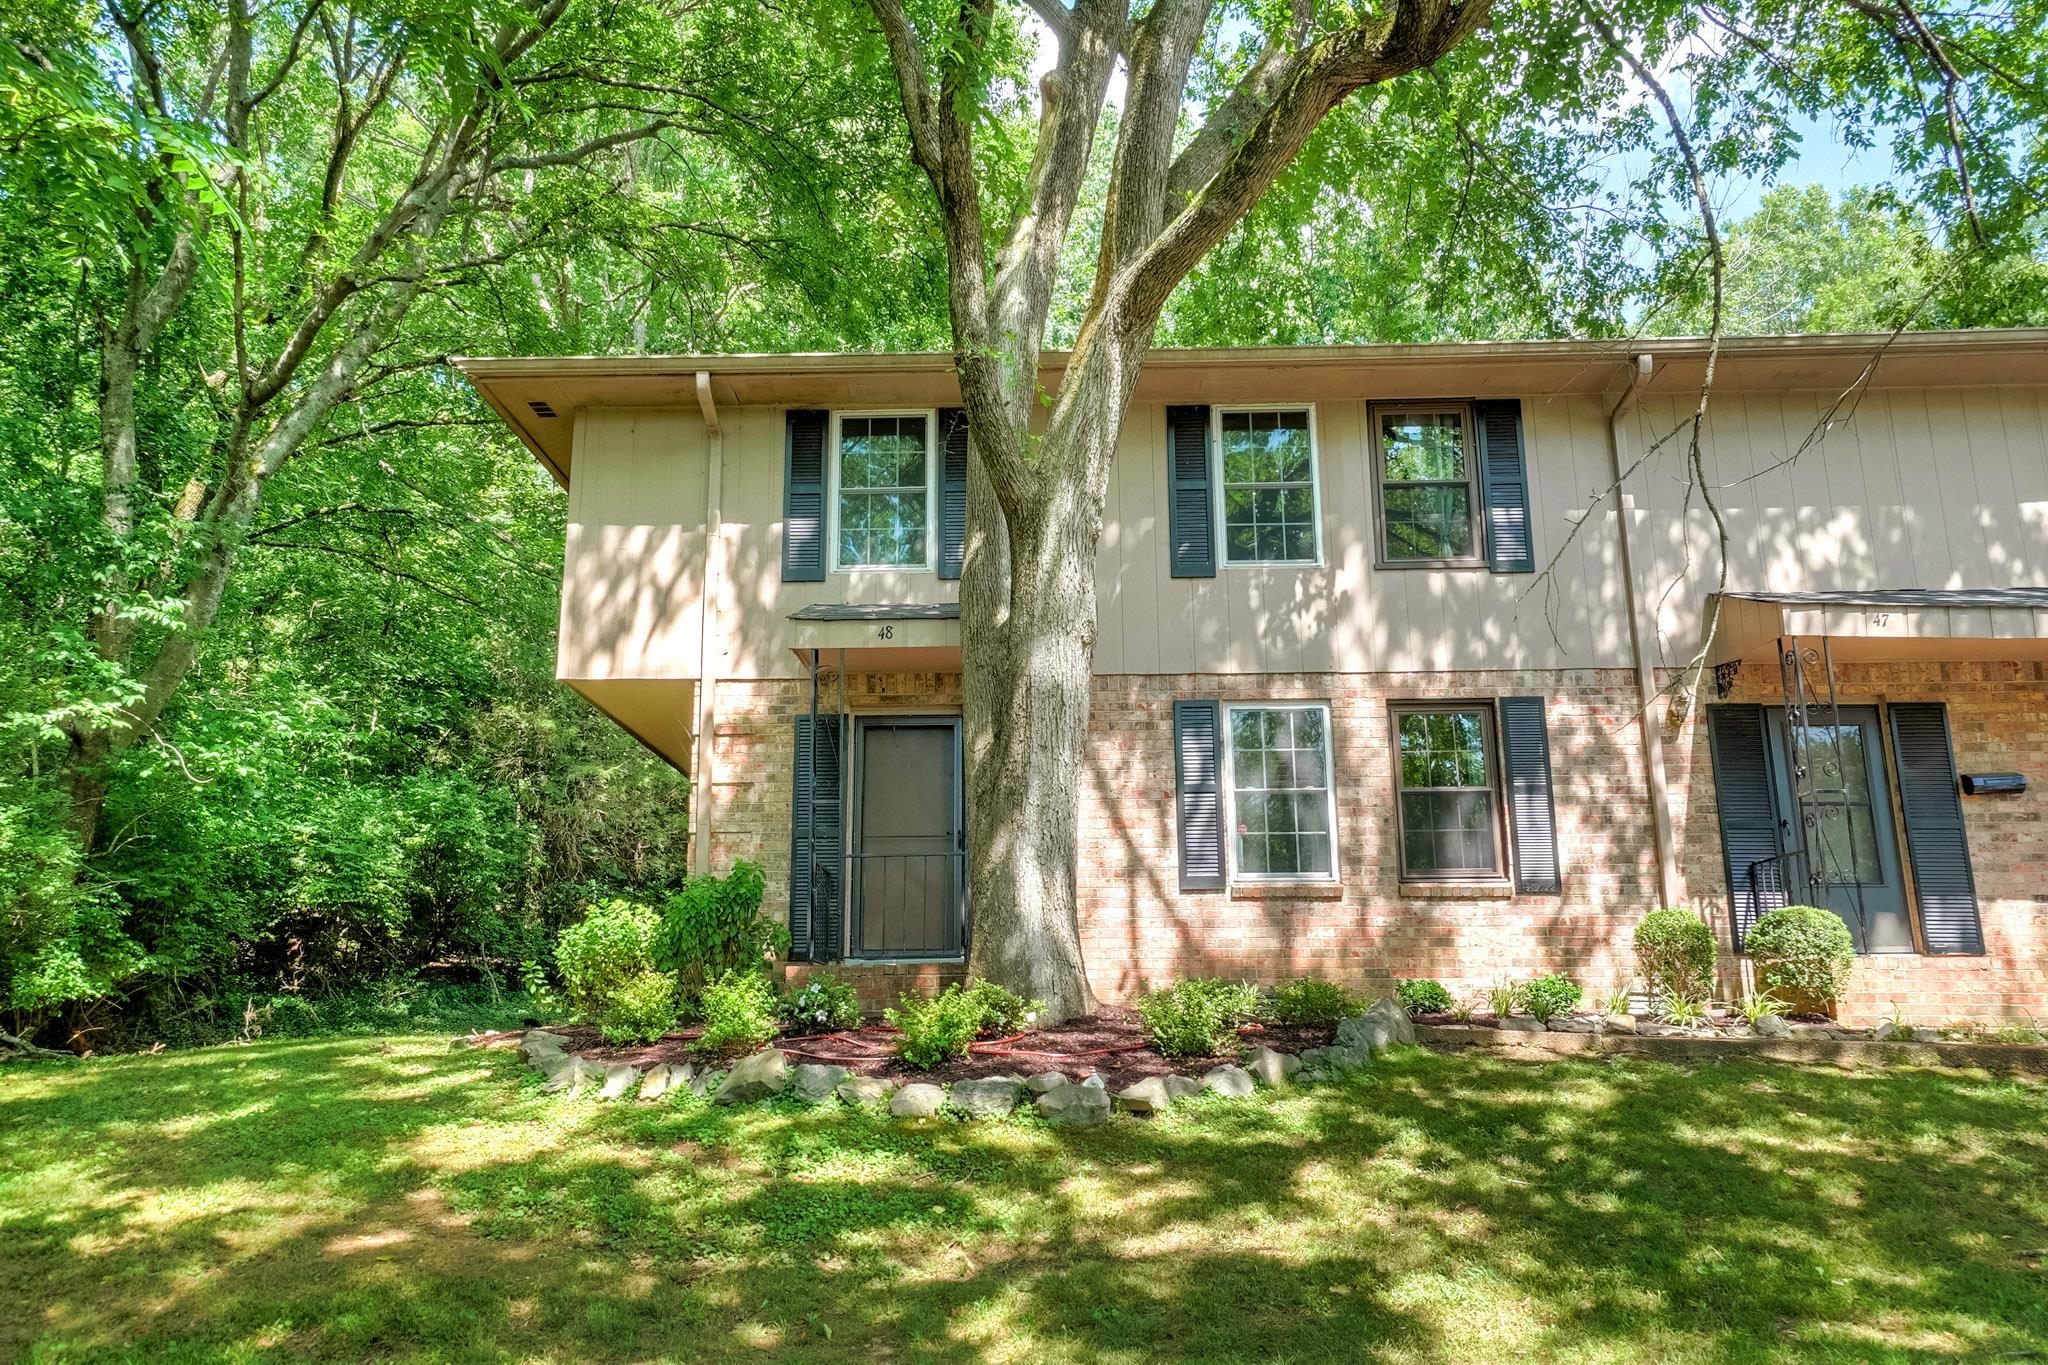 112 Bellevue Rd, #48, Nashville, TN 37221 - Nashville, TN real estate listing